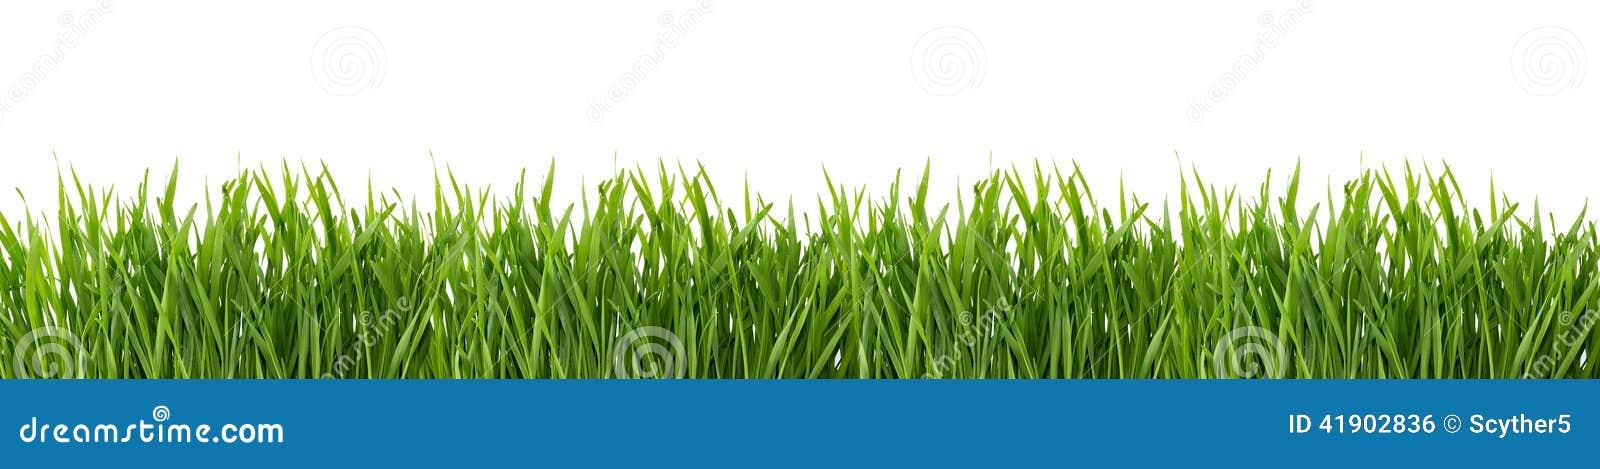 Grama verde isolada no fundo branco